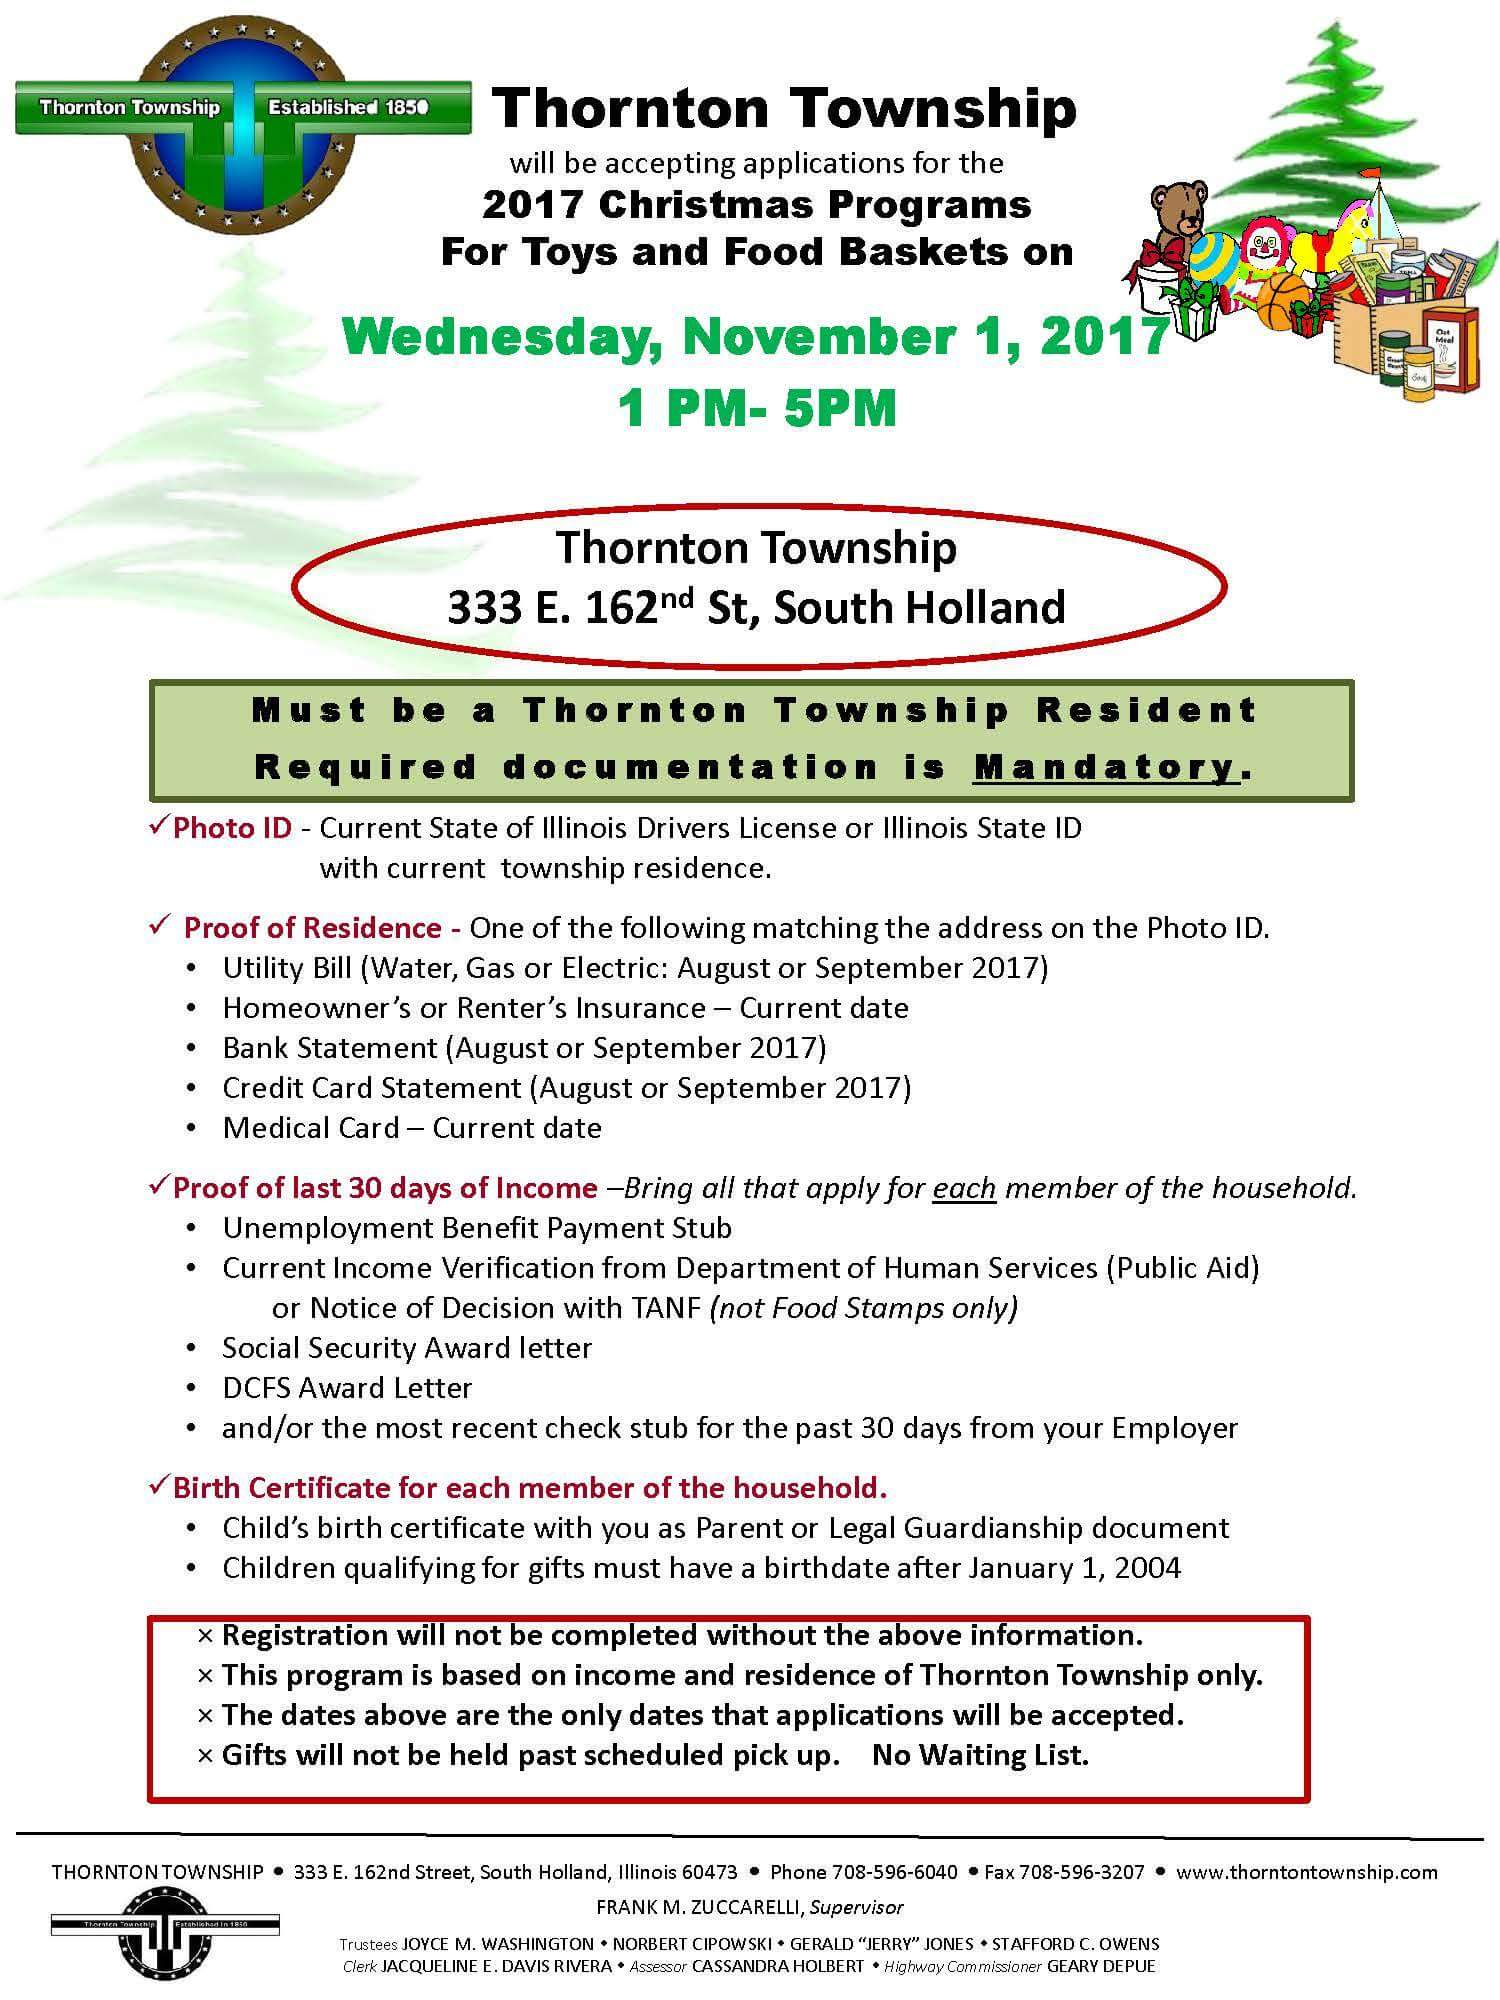 2017 Thornton Township Christmas Program Calumet City